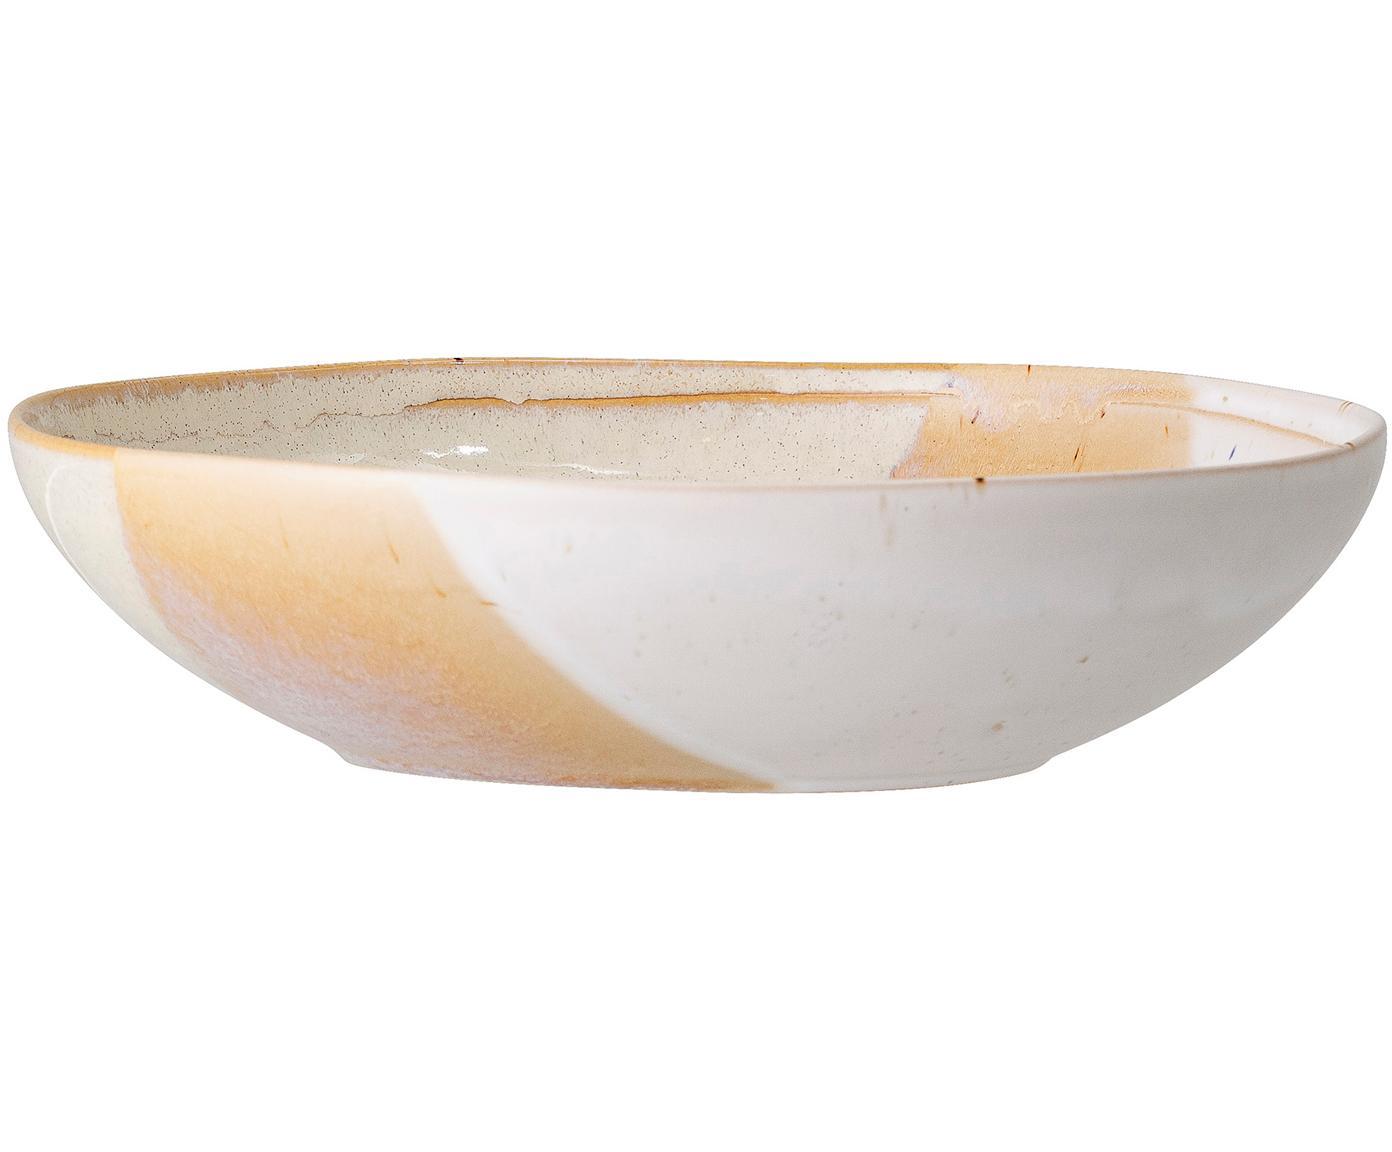 Handgemaakt soepbord April, Keramiek, Beigetinten, Ø 23 cm